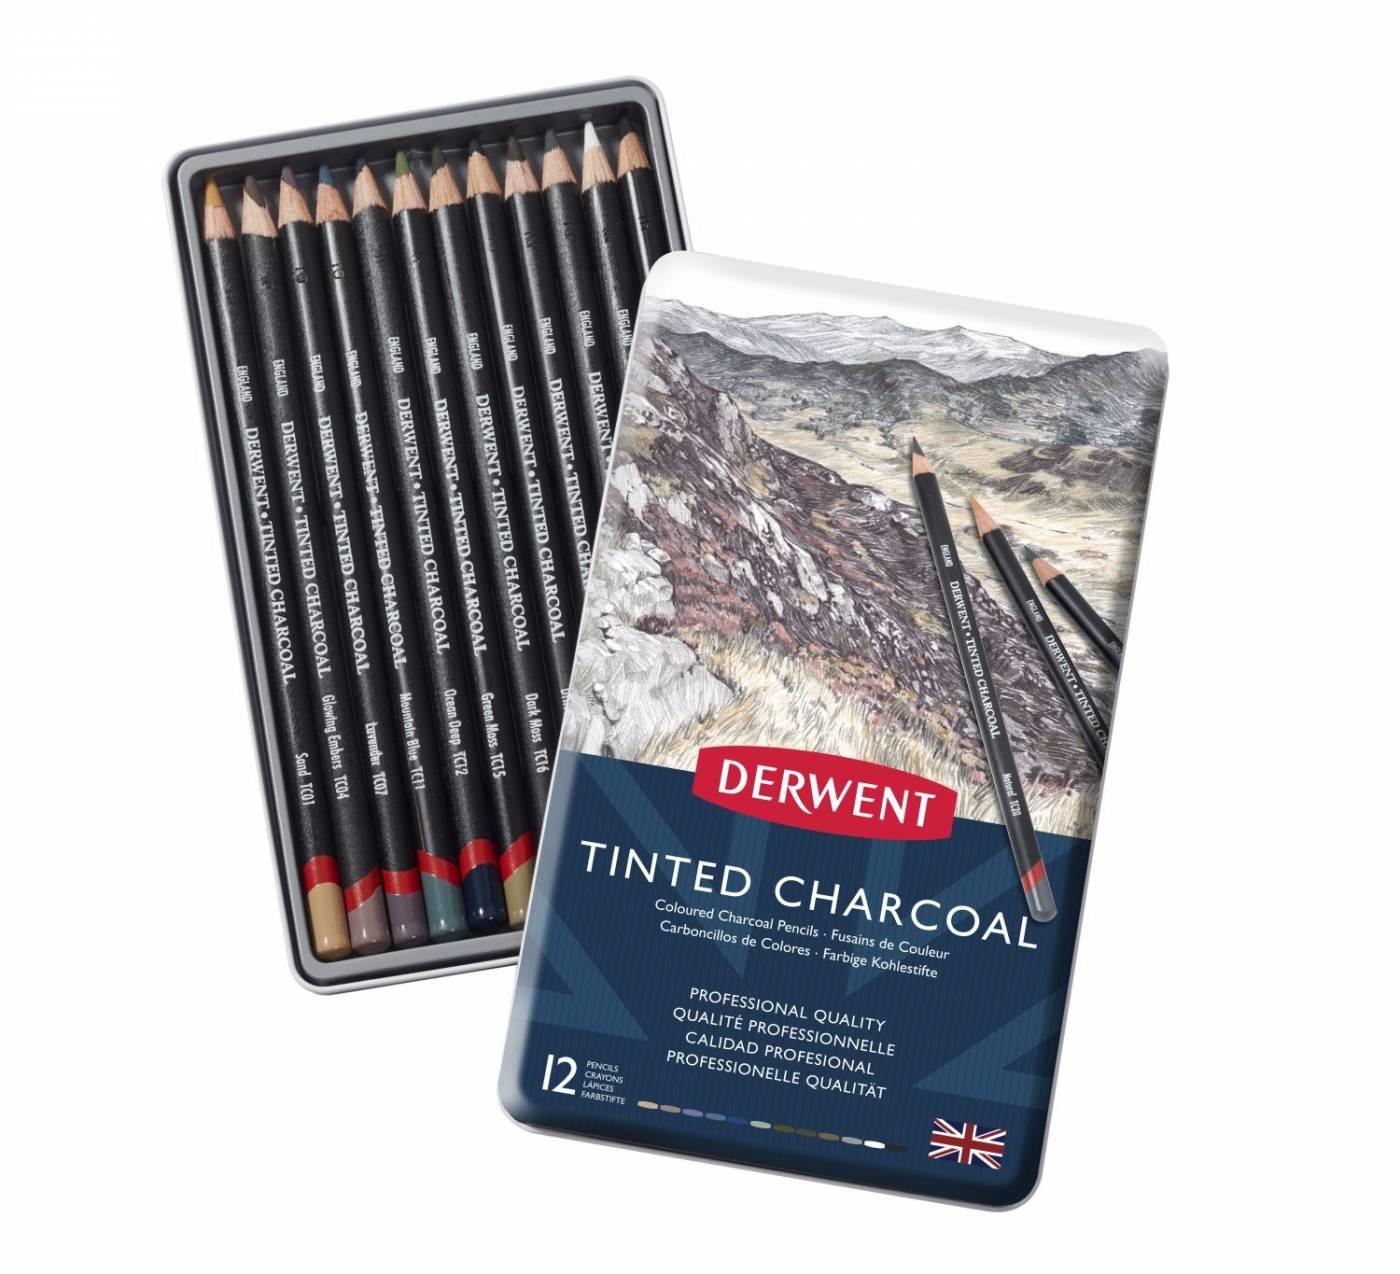 Lápis Carvão Colorido Derwent 12 cores - Tinted Charcoal